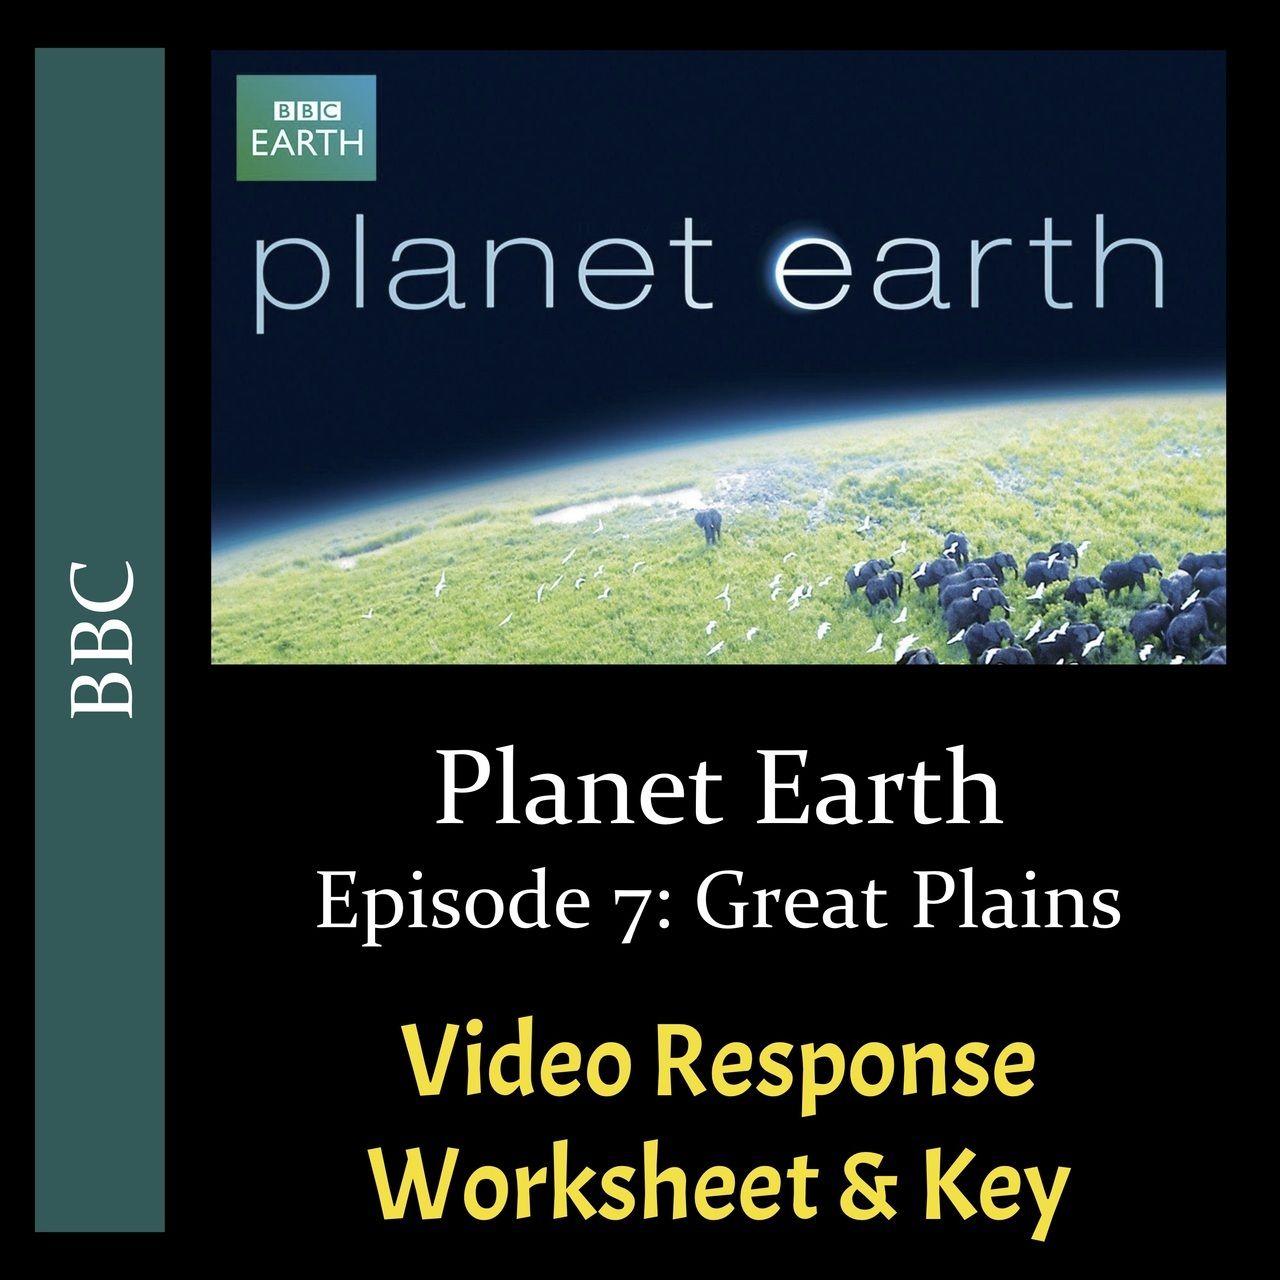 Planet Earth Great Plains Worksheet